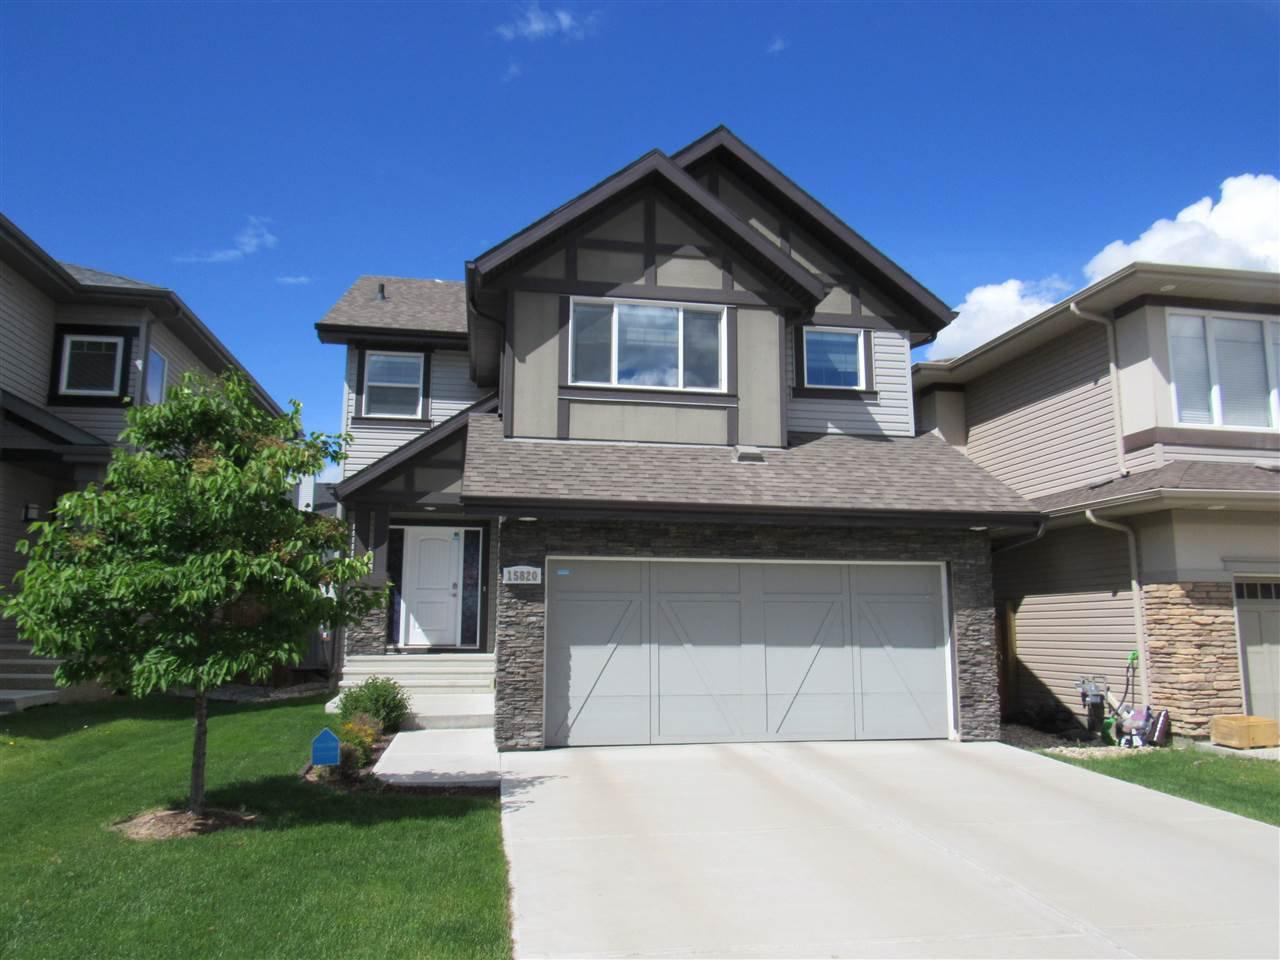 Main Photo: 15820 11 Avenue in Edmonton: Zone 56 House for sale : MLS®# E4200428